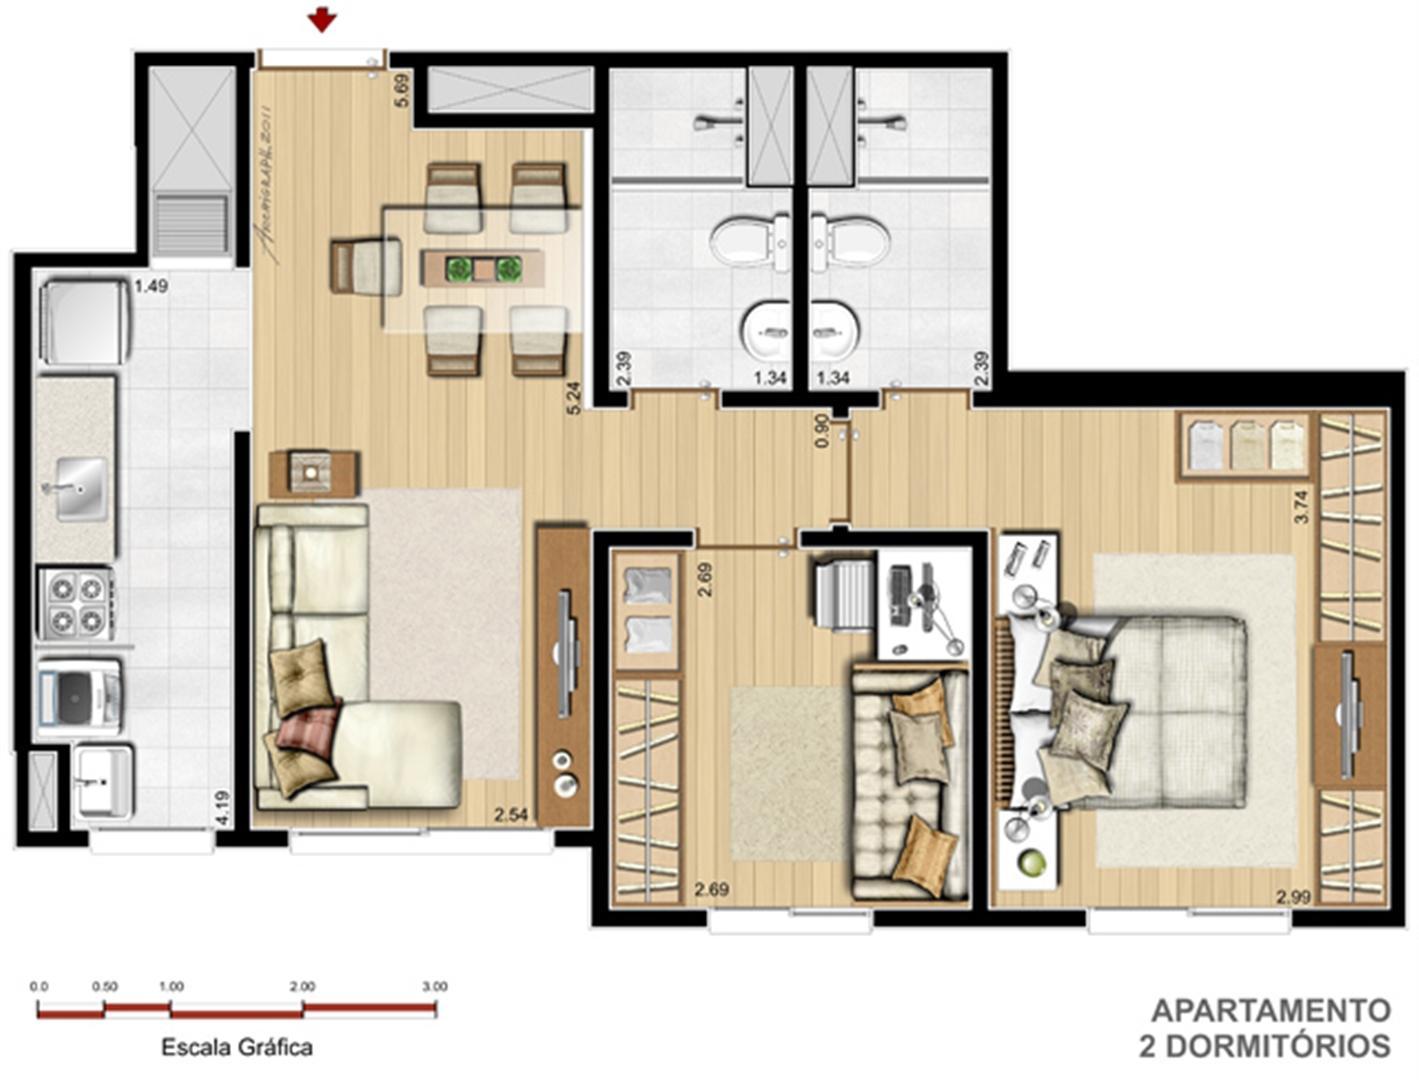 Apto. 2 dorms. com suíte - 56,21 m² | Way – Apartamento no  Partenon - Porto Alegre - Rio Grande do Sul